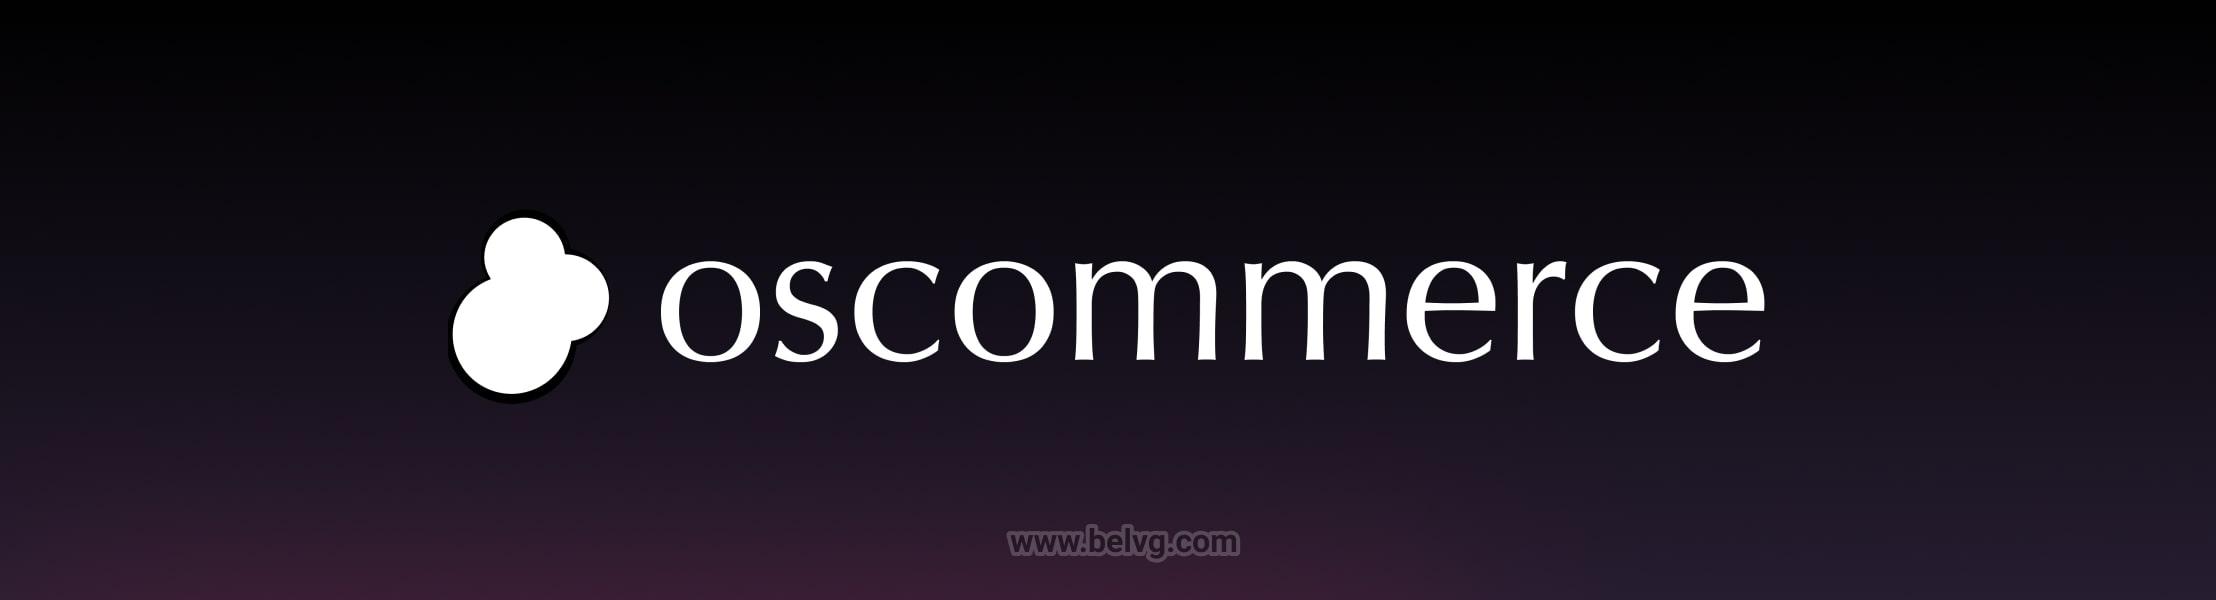 os commerce